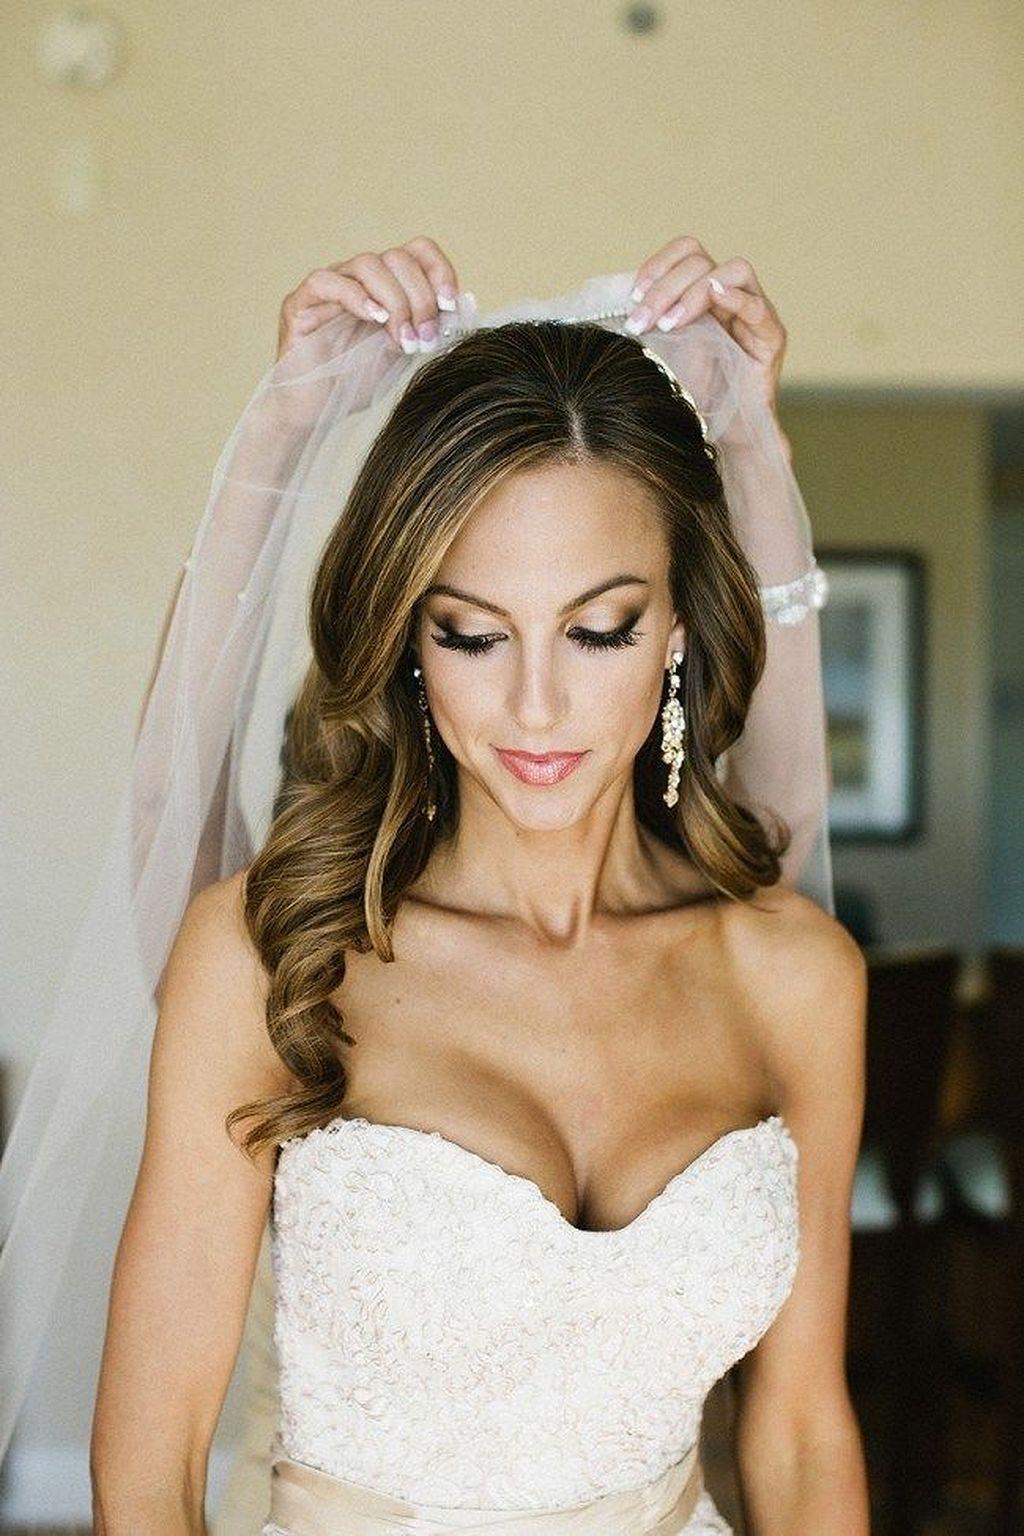 Wedding Hairstyles Down 40 Wedding Hair Down With Veil Ideas  Veil Weddings And Wedding